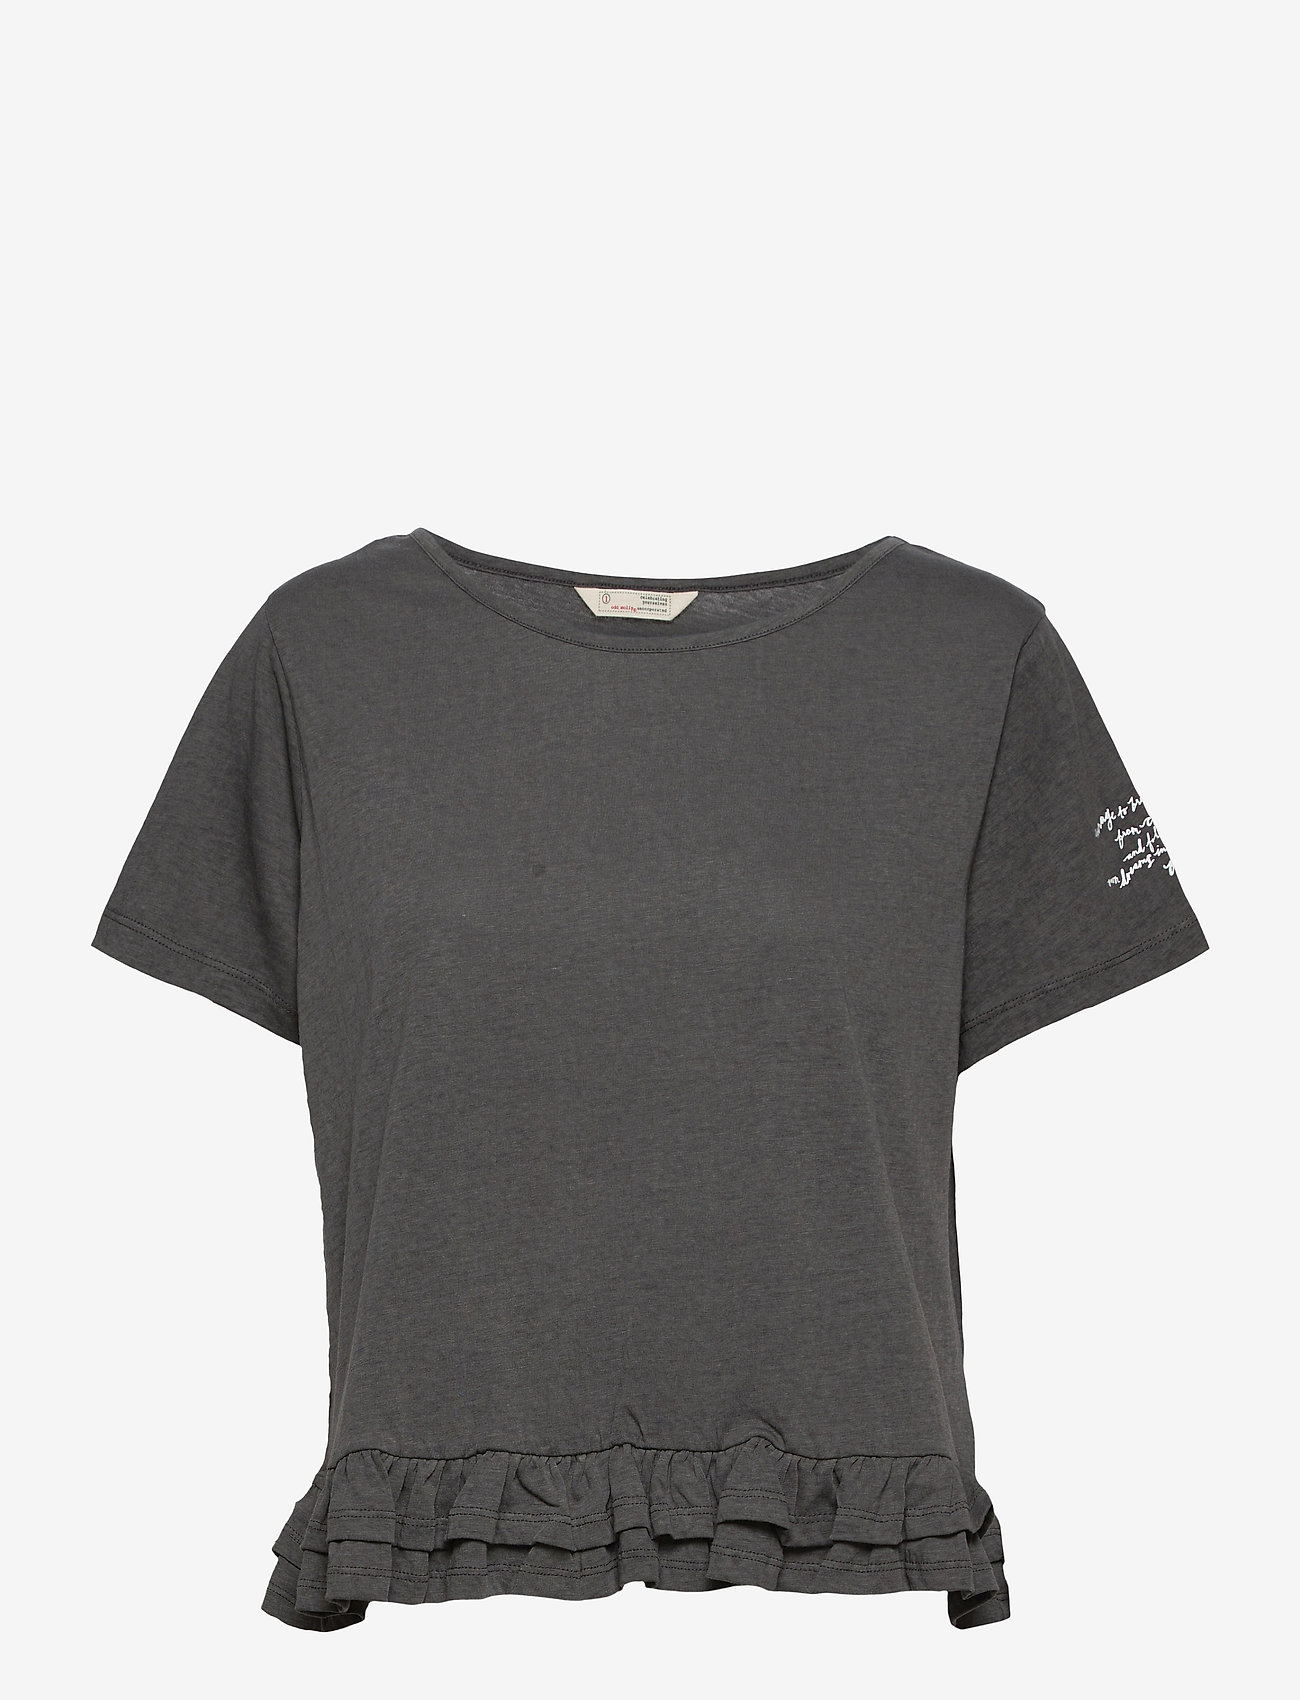 ODD MOLLY - Sally Top - t-shirts - asphalt - 1